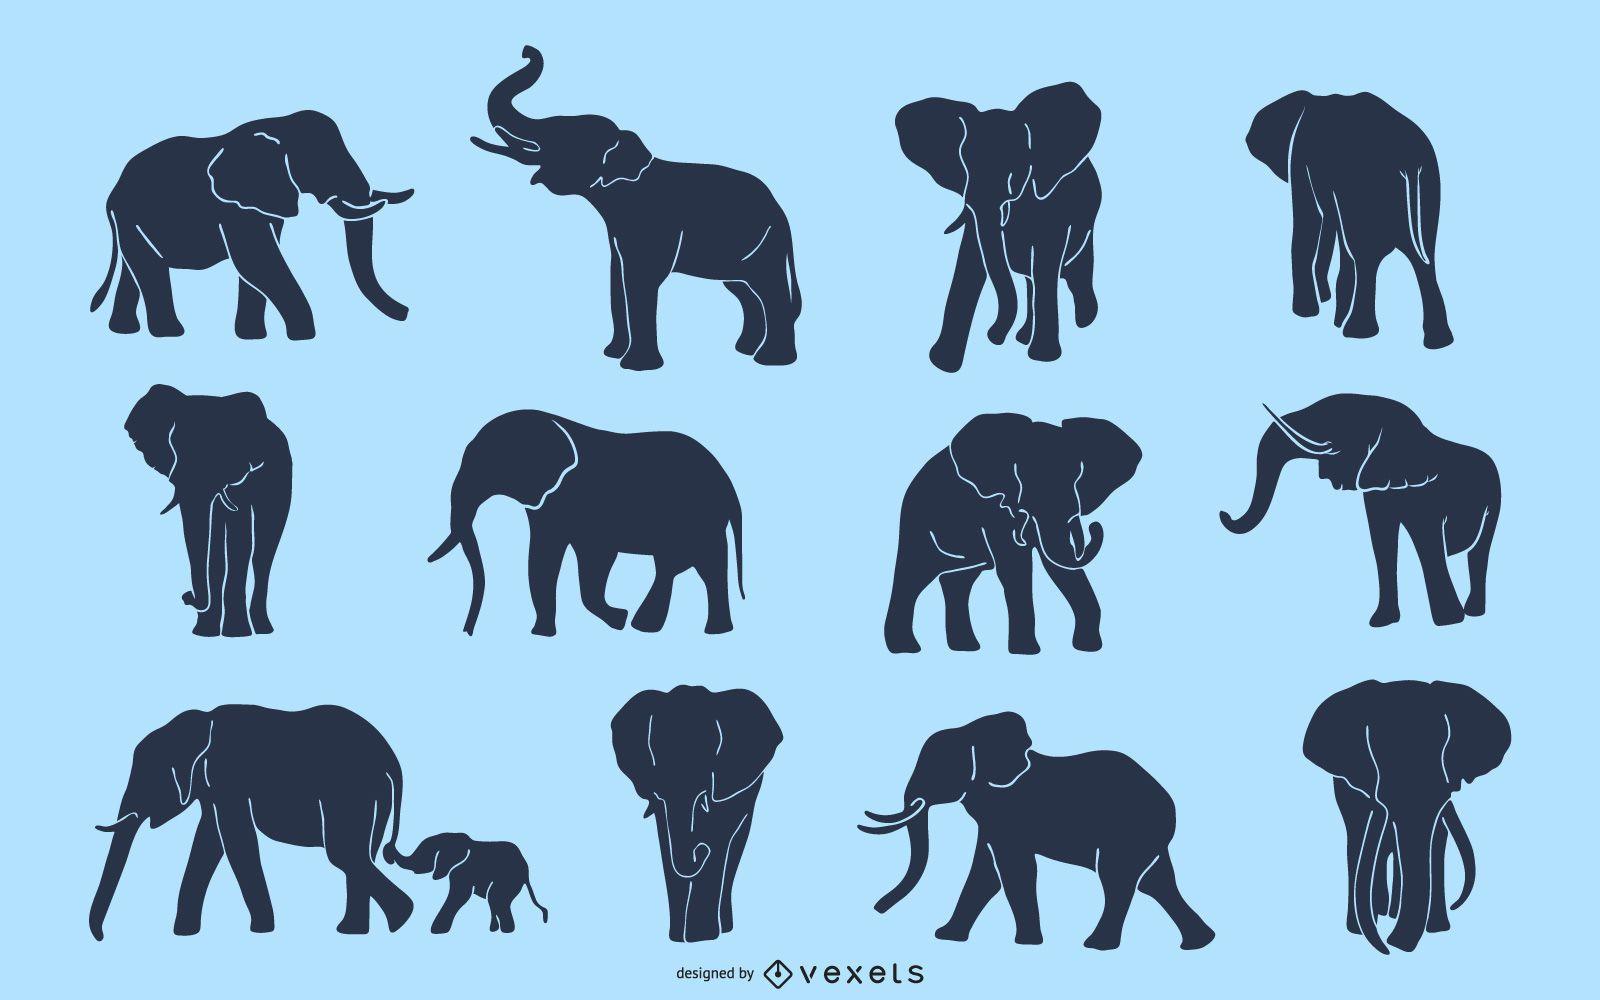 Elephant Silhouette Design Pack